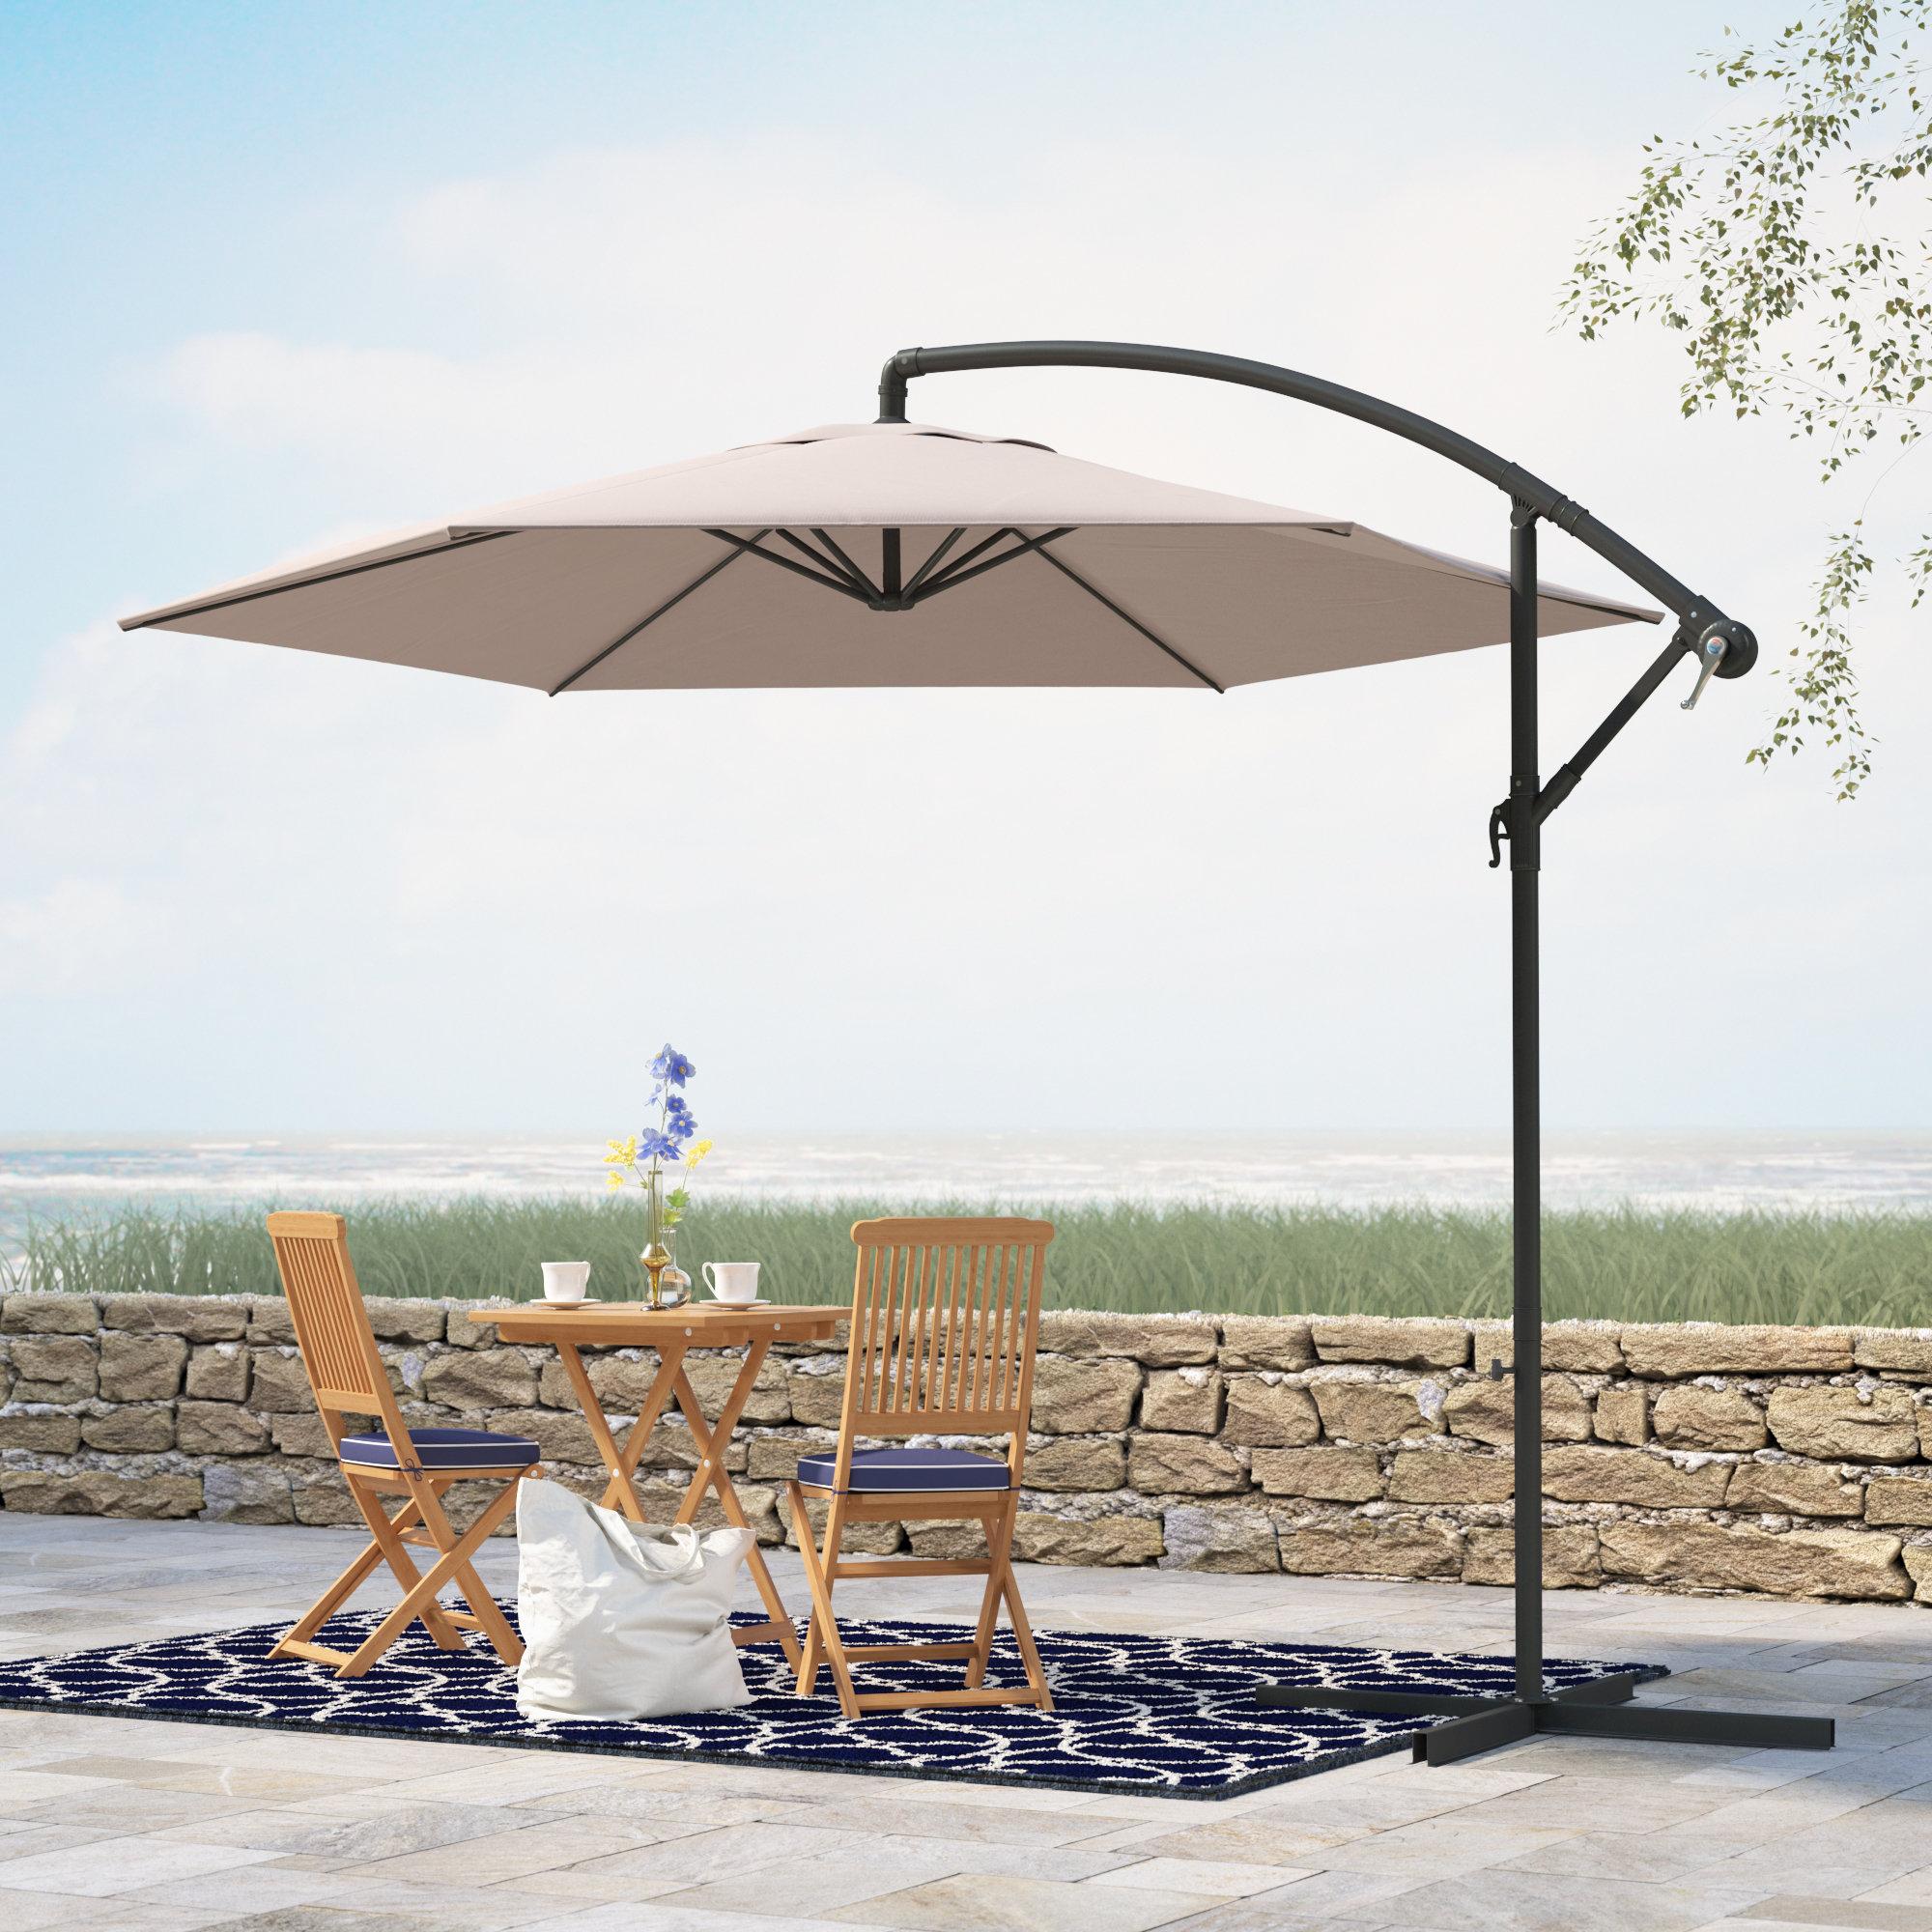 Alyssa Freeport Park Market Umbrellas Pertaining To Most Up To Date Alyssa 10' Cantilever Umbrella (View 3 of 20)